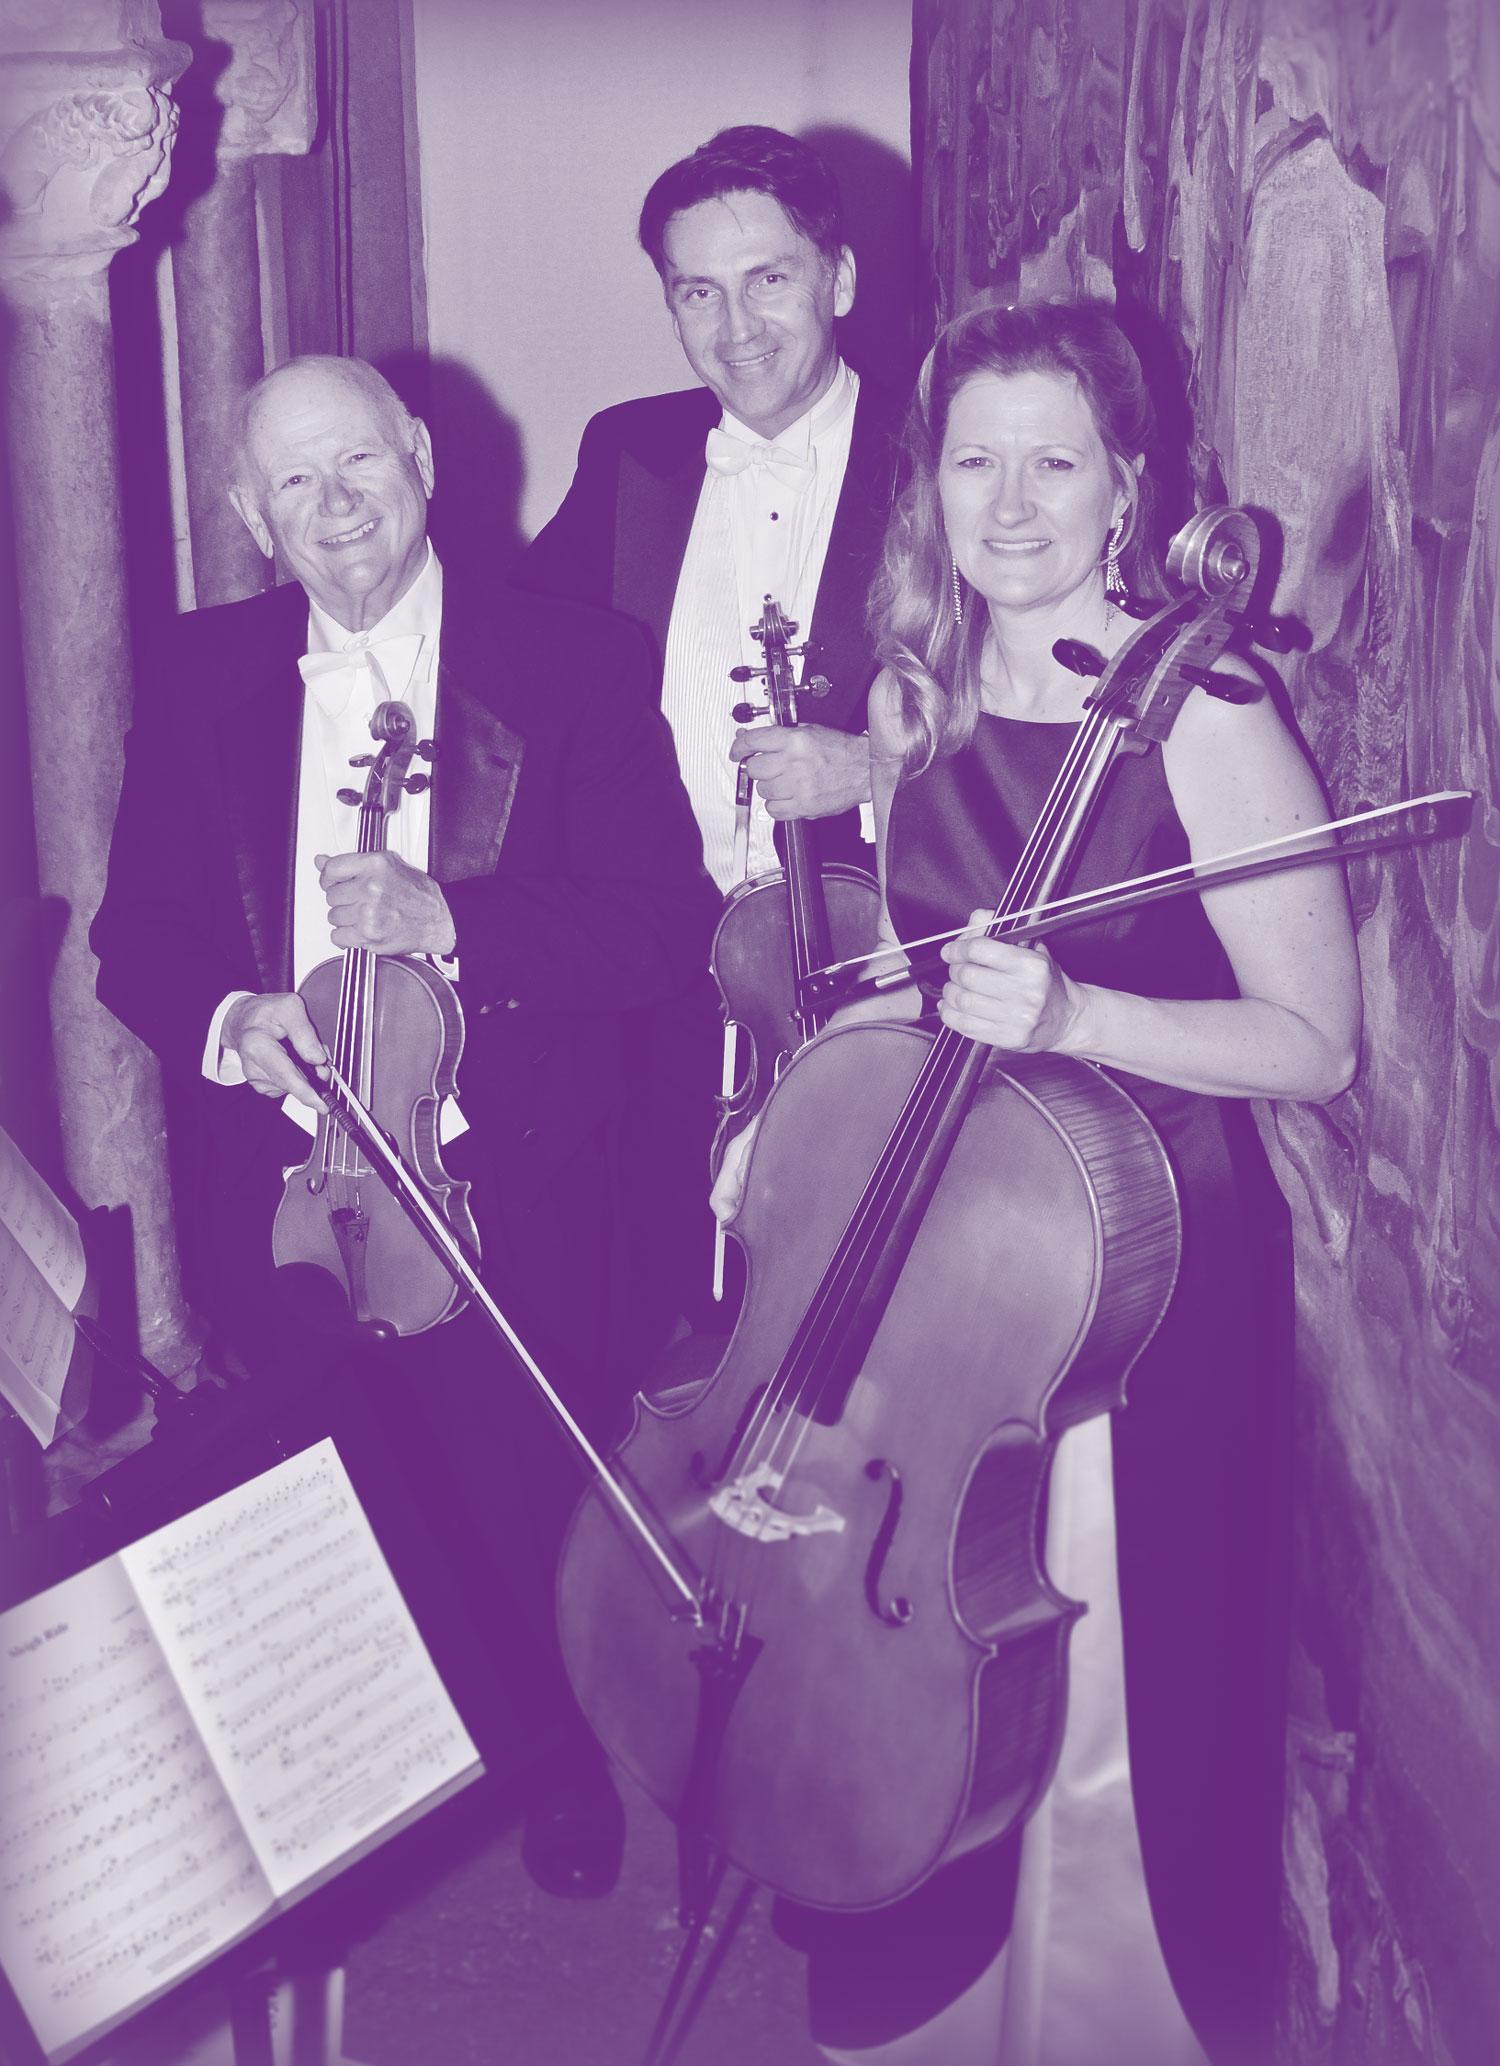 hearst-trio-violin-cello-strings-purple.jpg